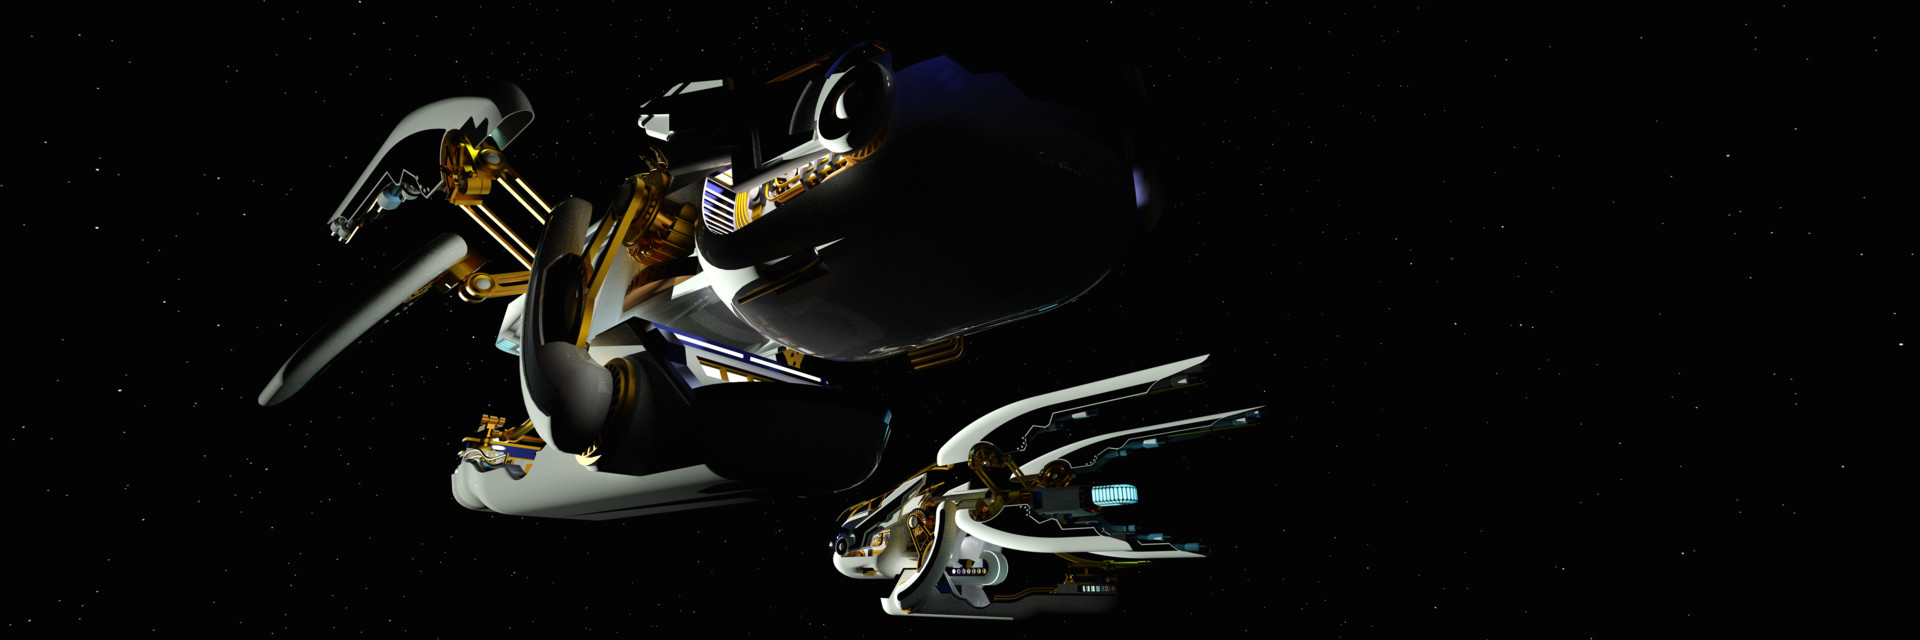 Duane kemp sky orca model by muhammx f scene 02 post